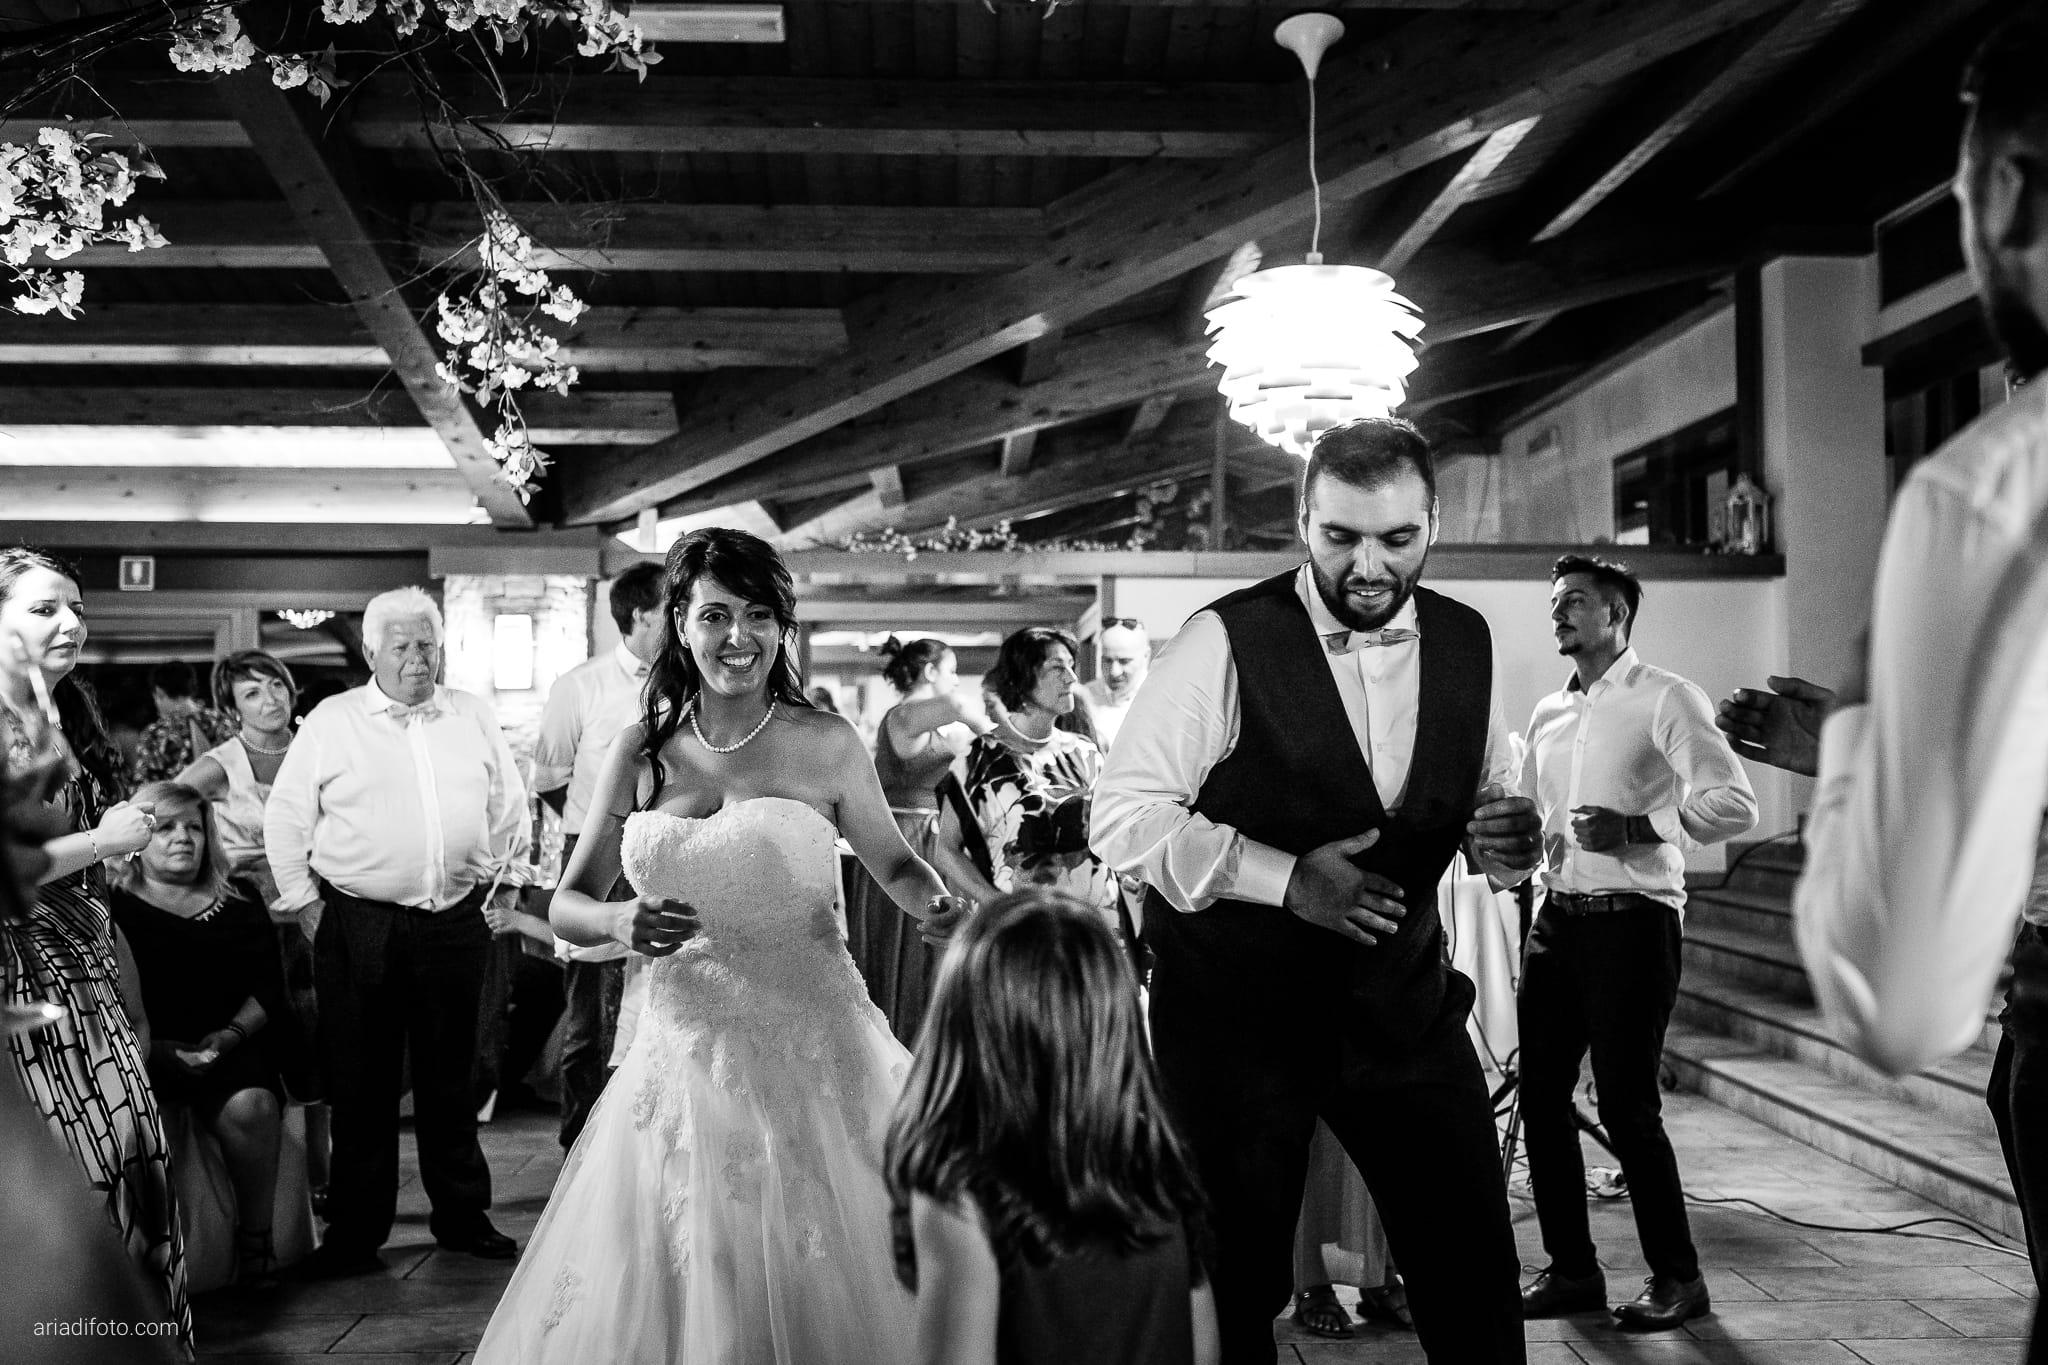 Rosylenia Luca Matrimonio Duino Ristorante Napoleone Castions Udine ricevimento balli party